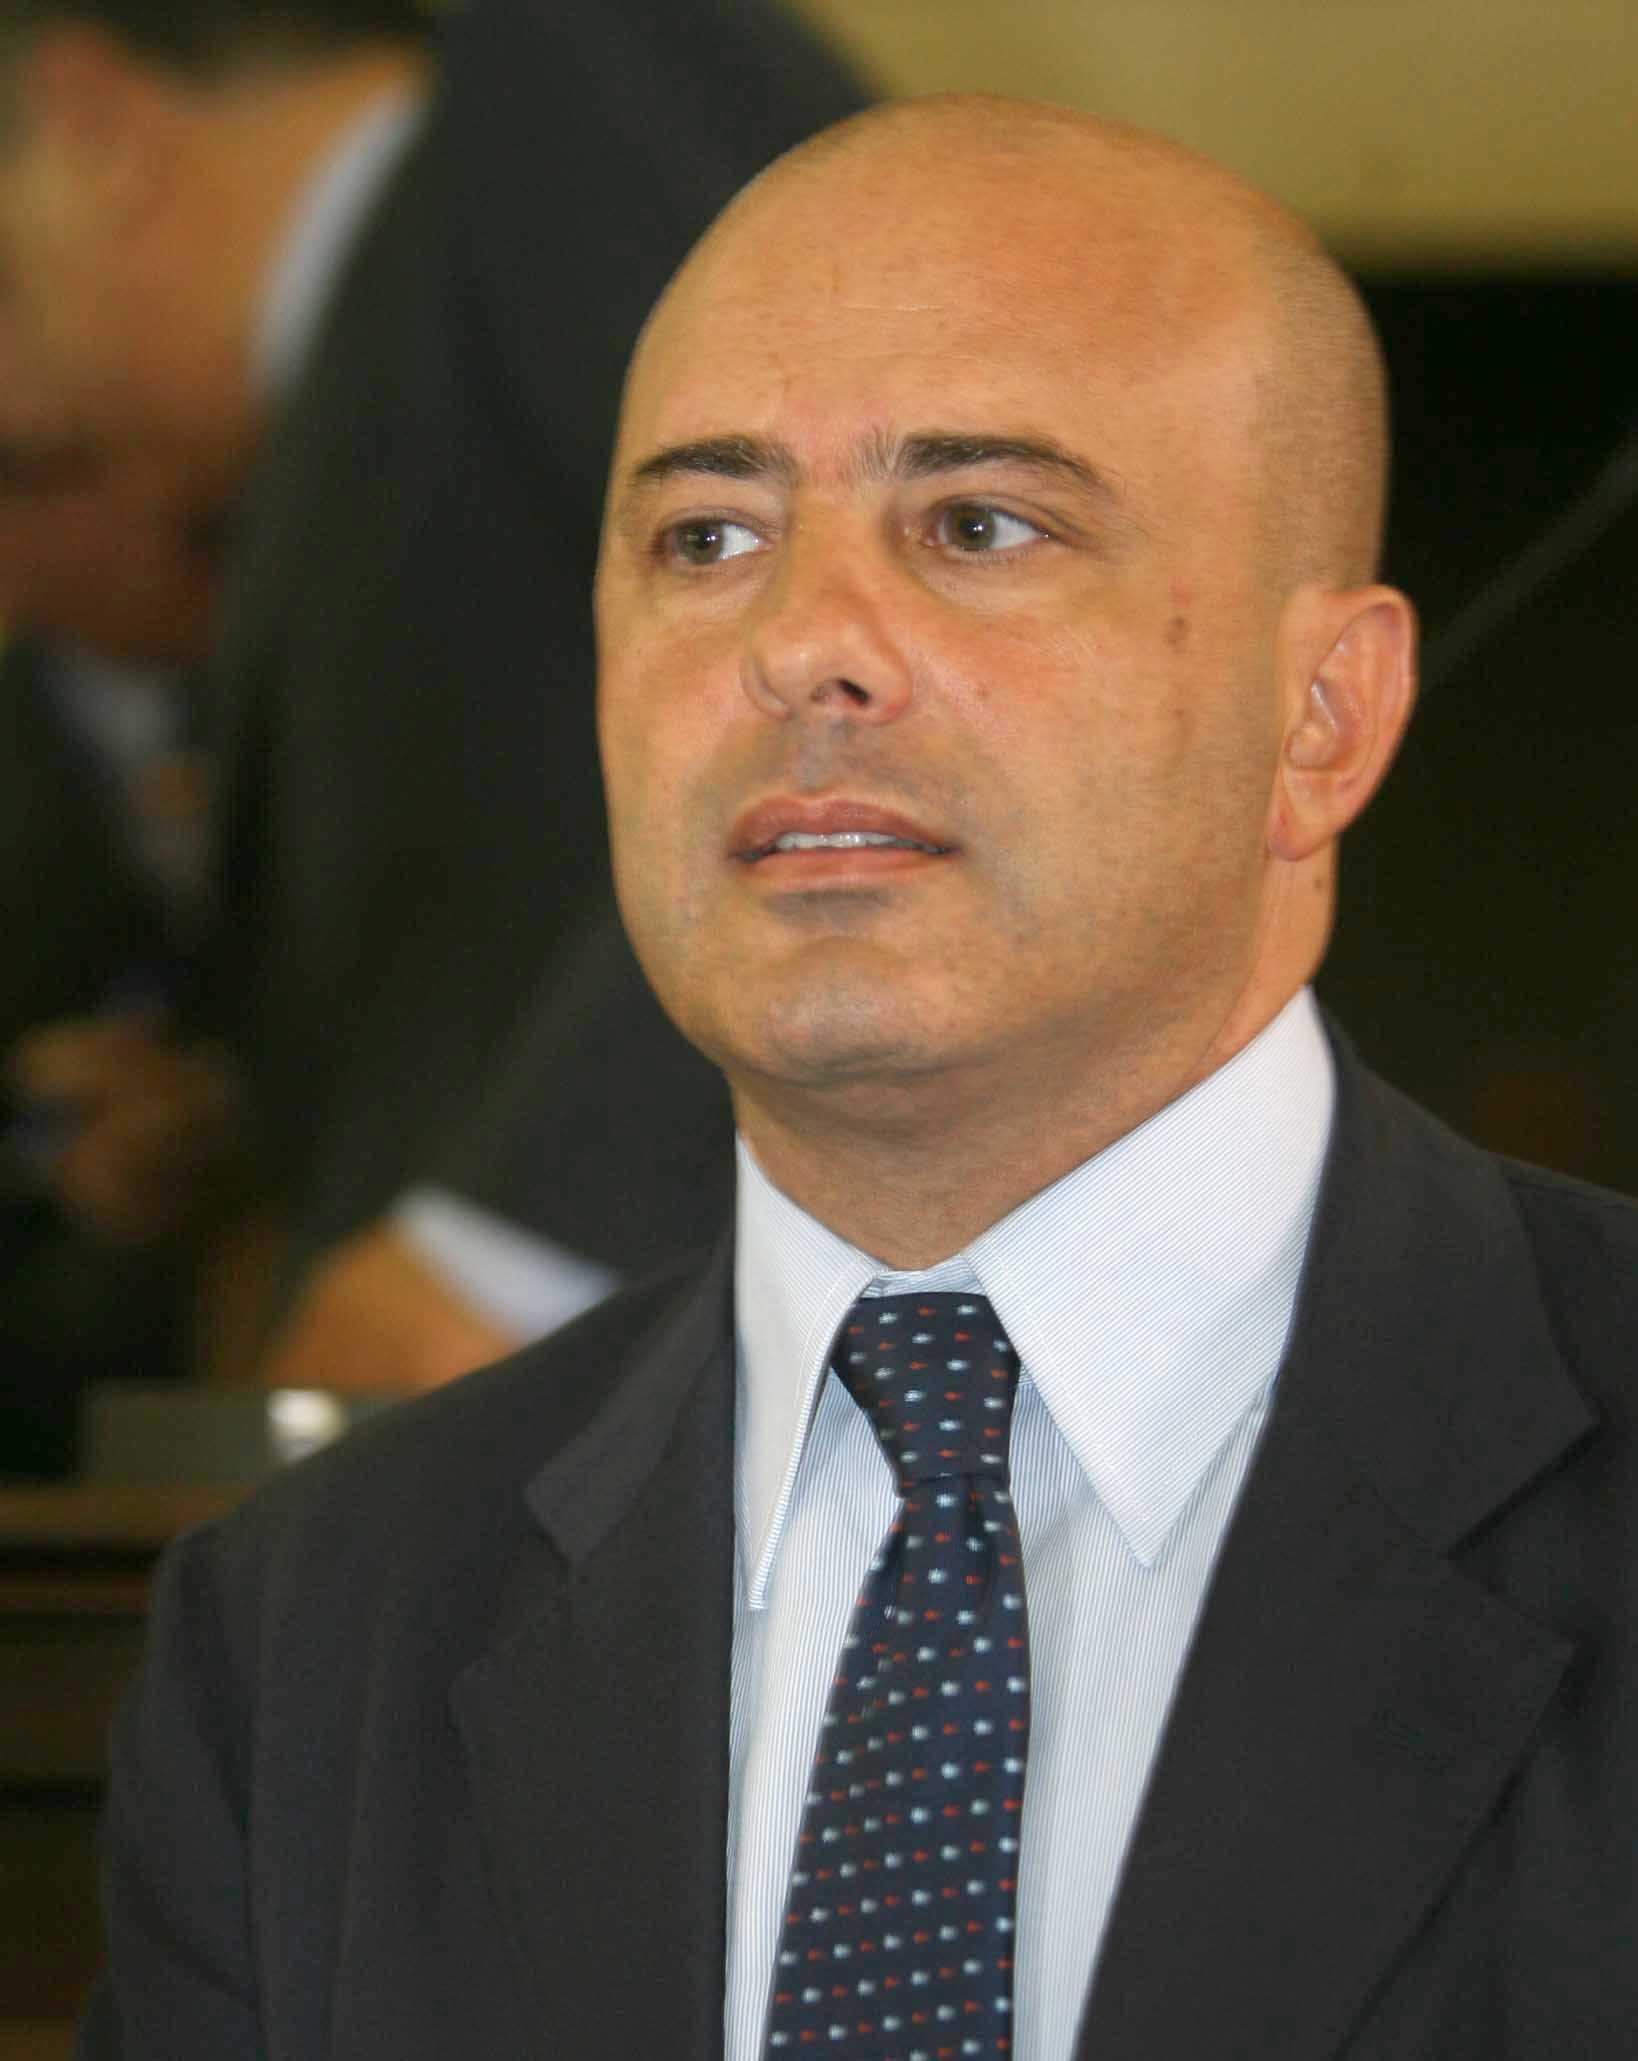 Antonio Pentangelo